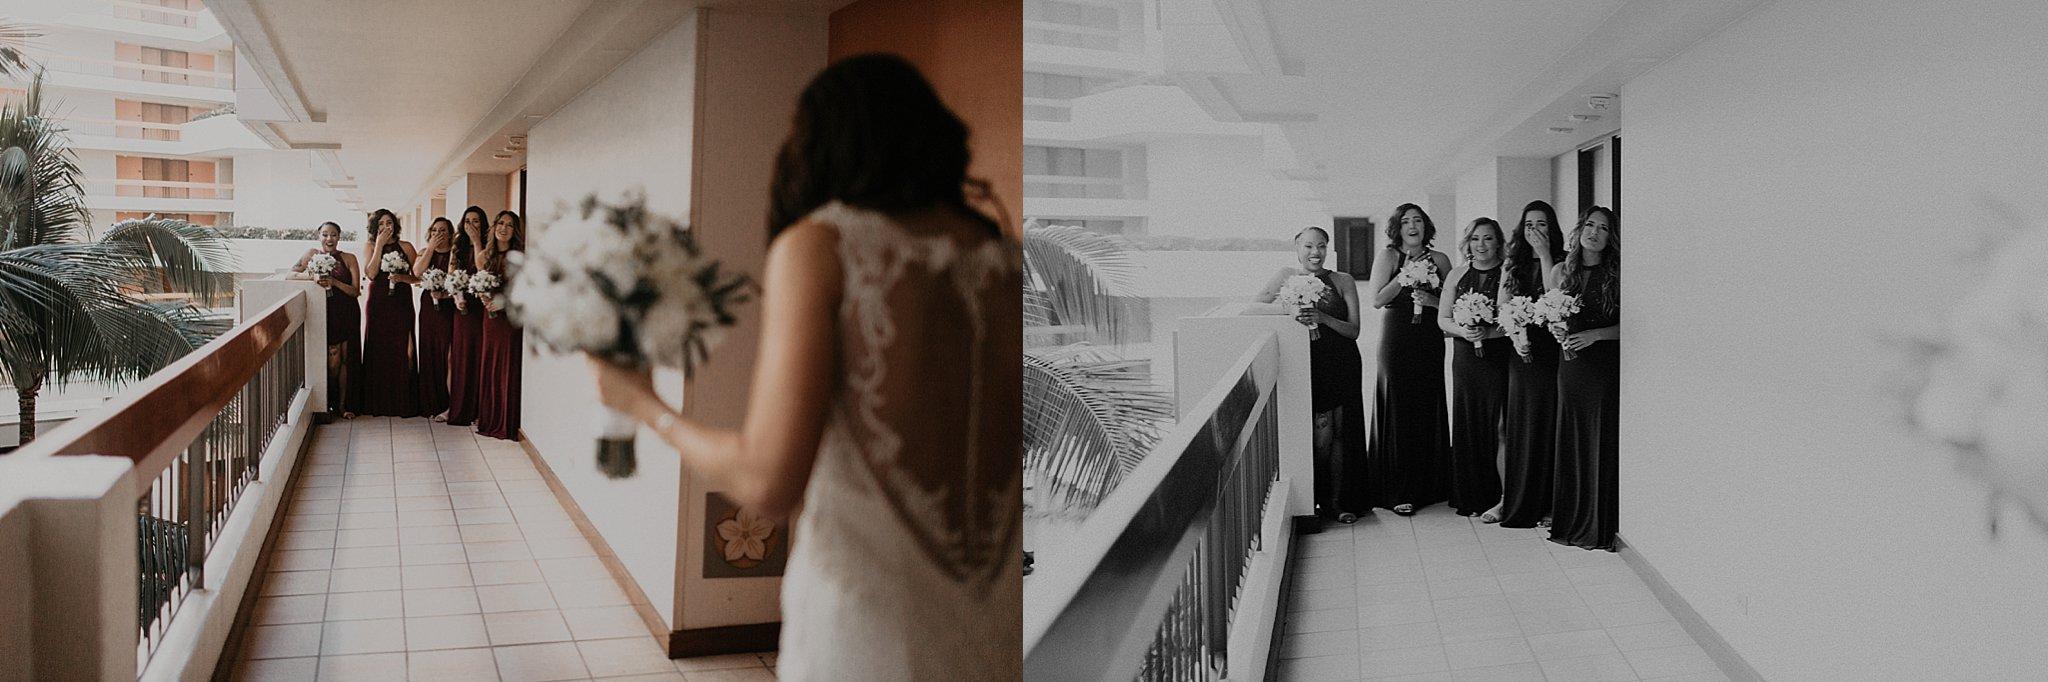 samantha_mcfarlen_bellingham_washington_engagement_photography_seattle_wedding_photographer_0185.jpg